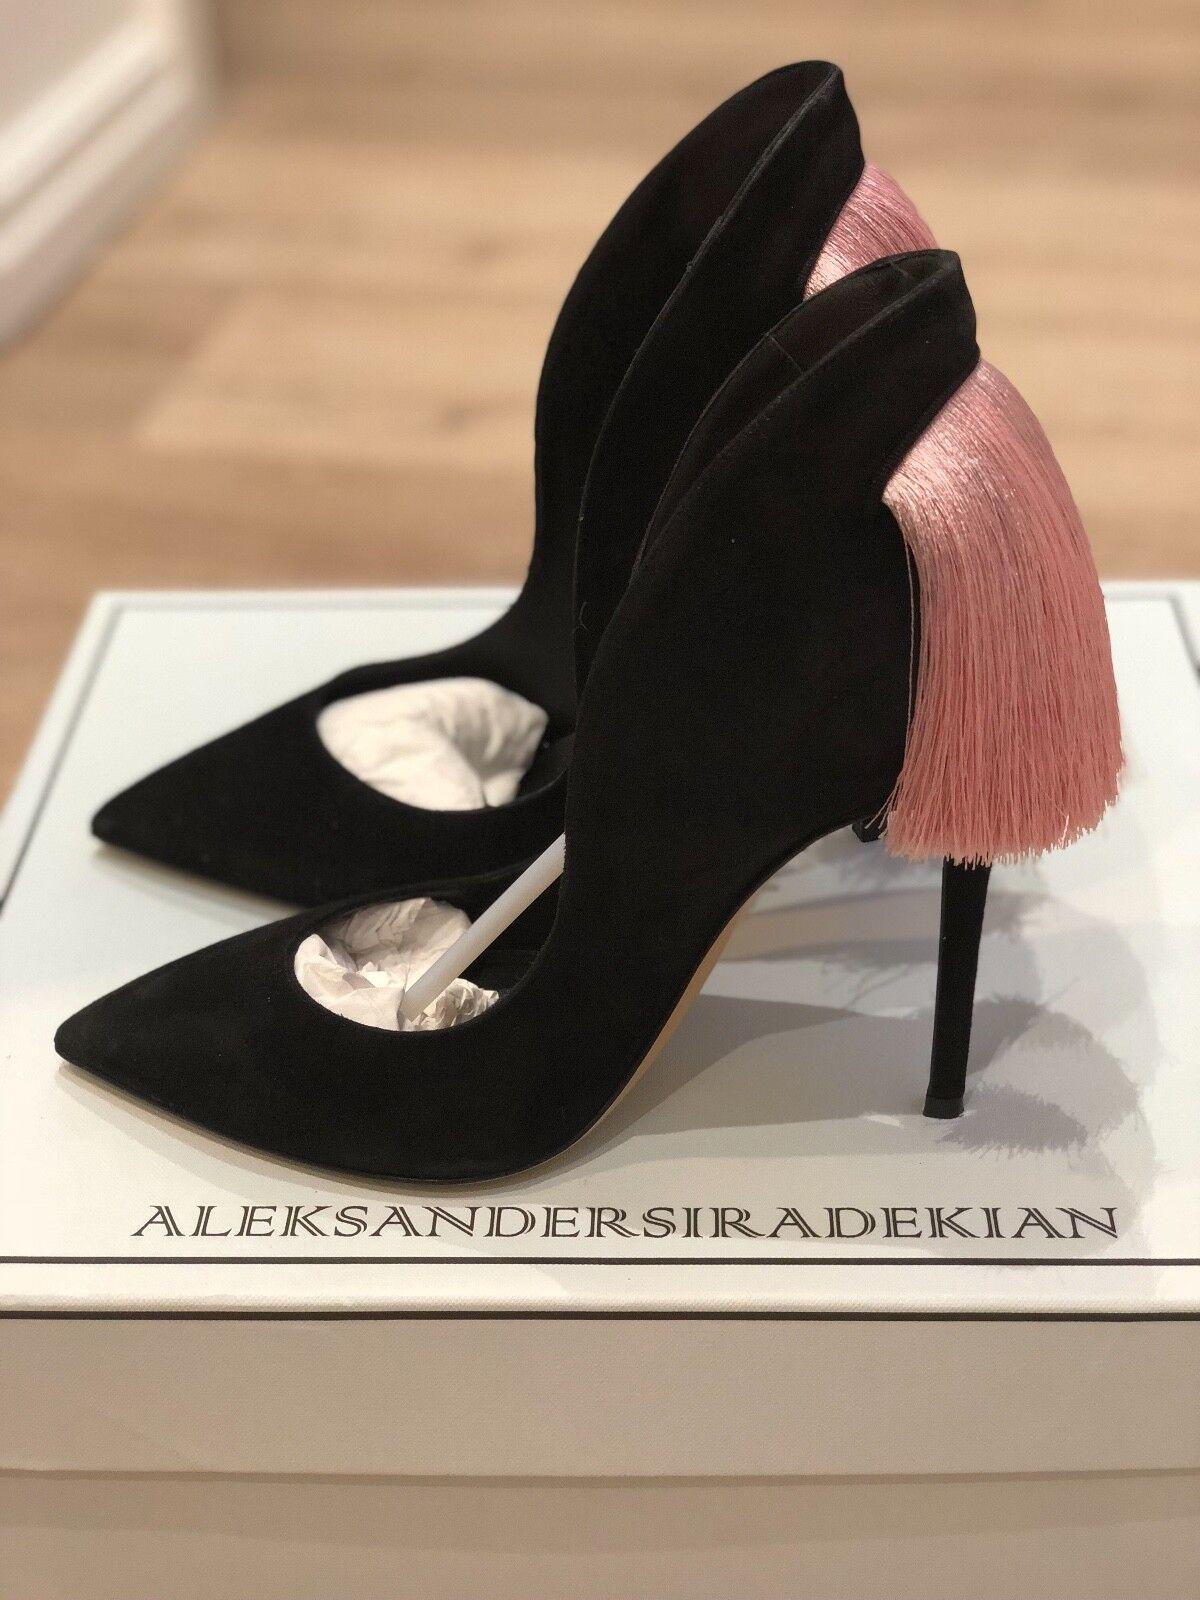 Aleksander Siradekian black shoes with pink tassel size Eu 37